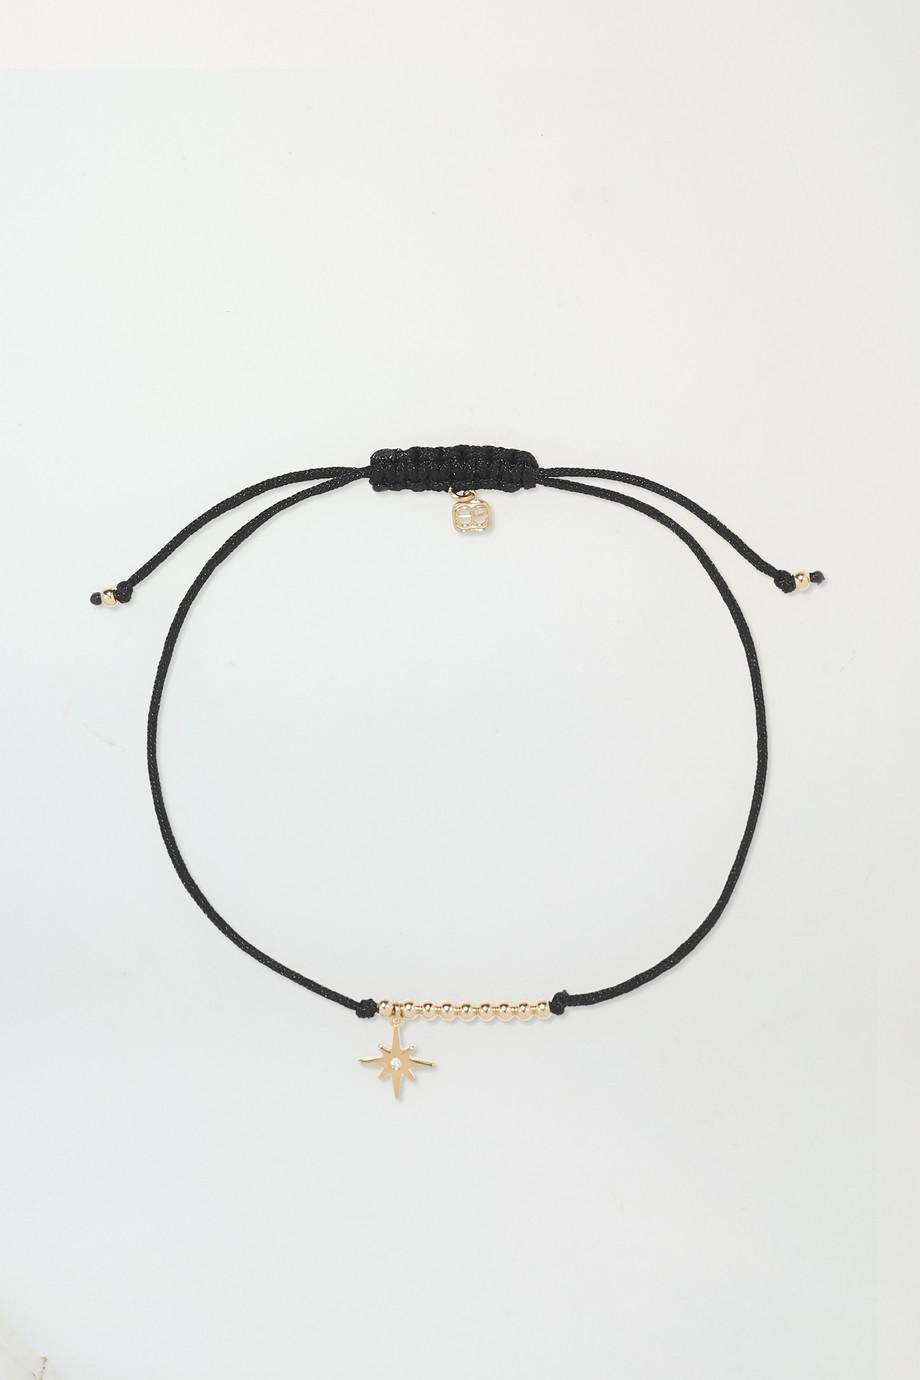 Sydney Evan Starburst 14-karat gold, cord and diamond bracelet